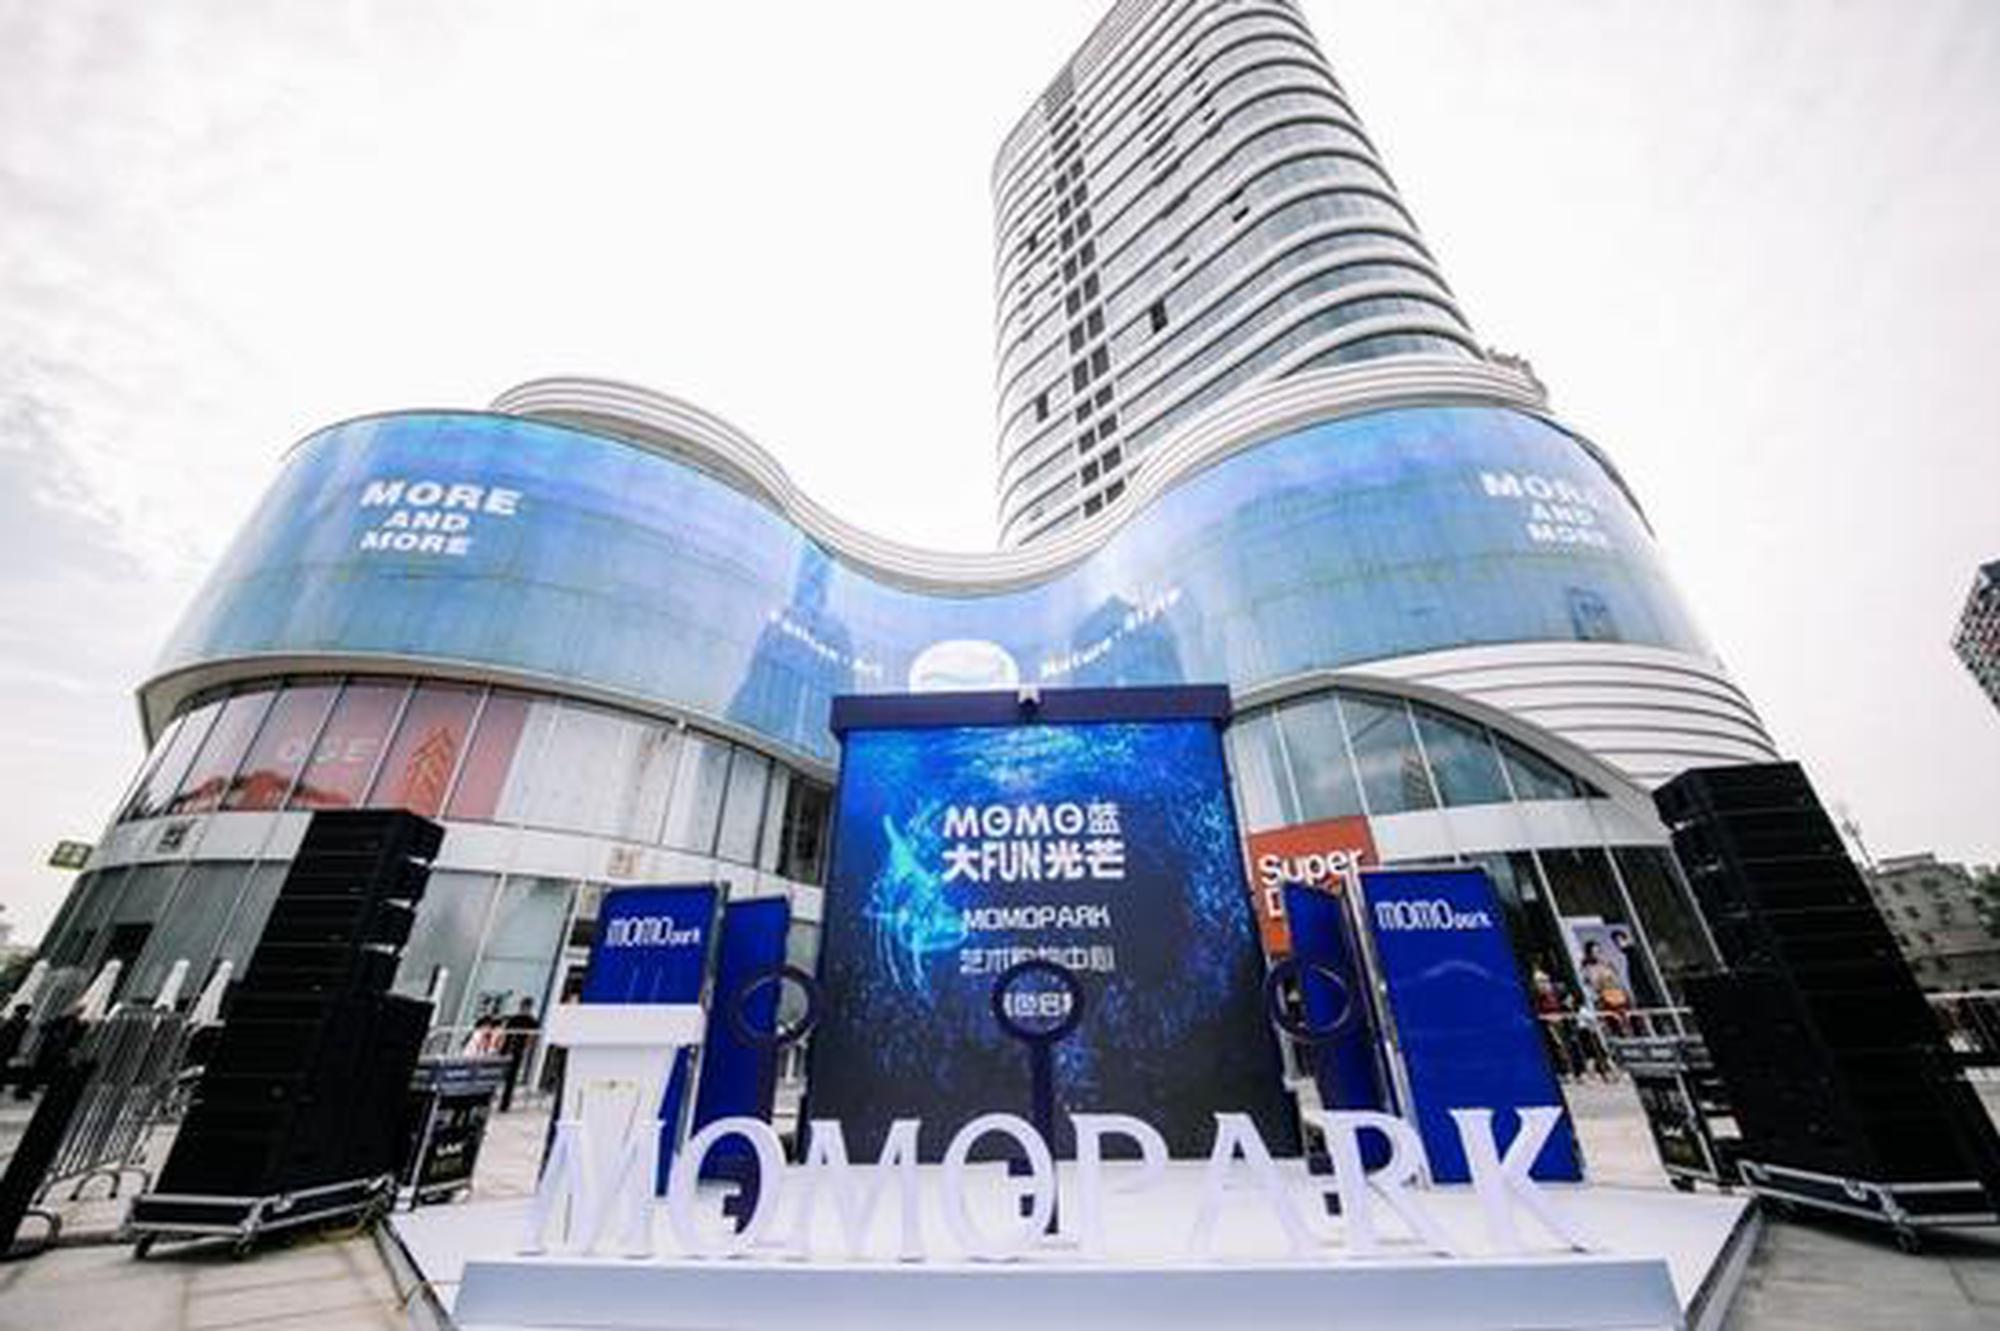 MOMOPARK艺术购物中心蓝色启幕